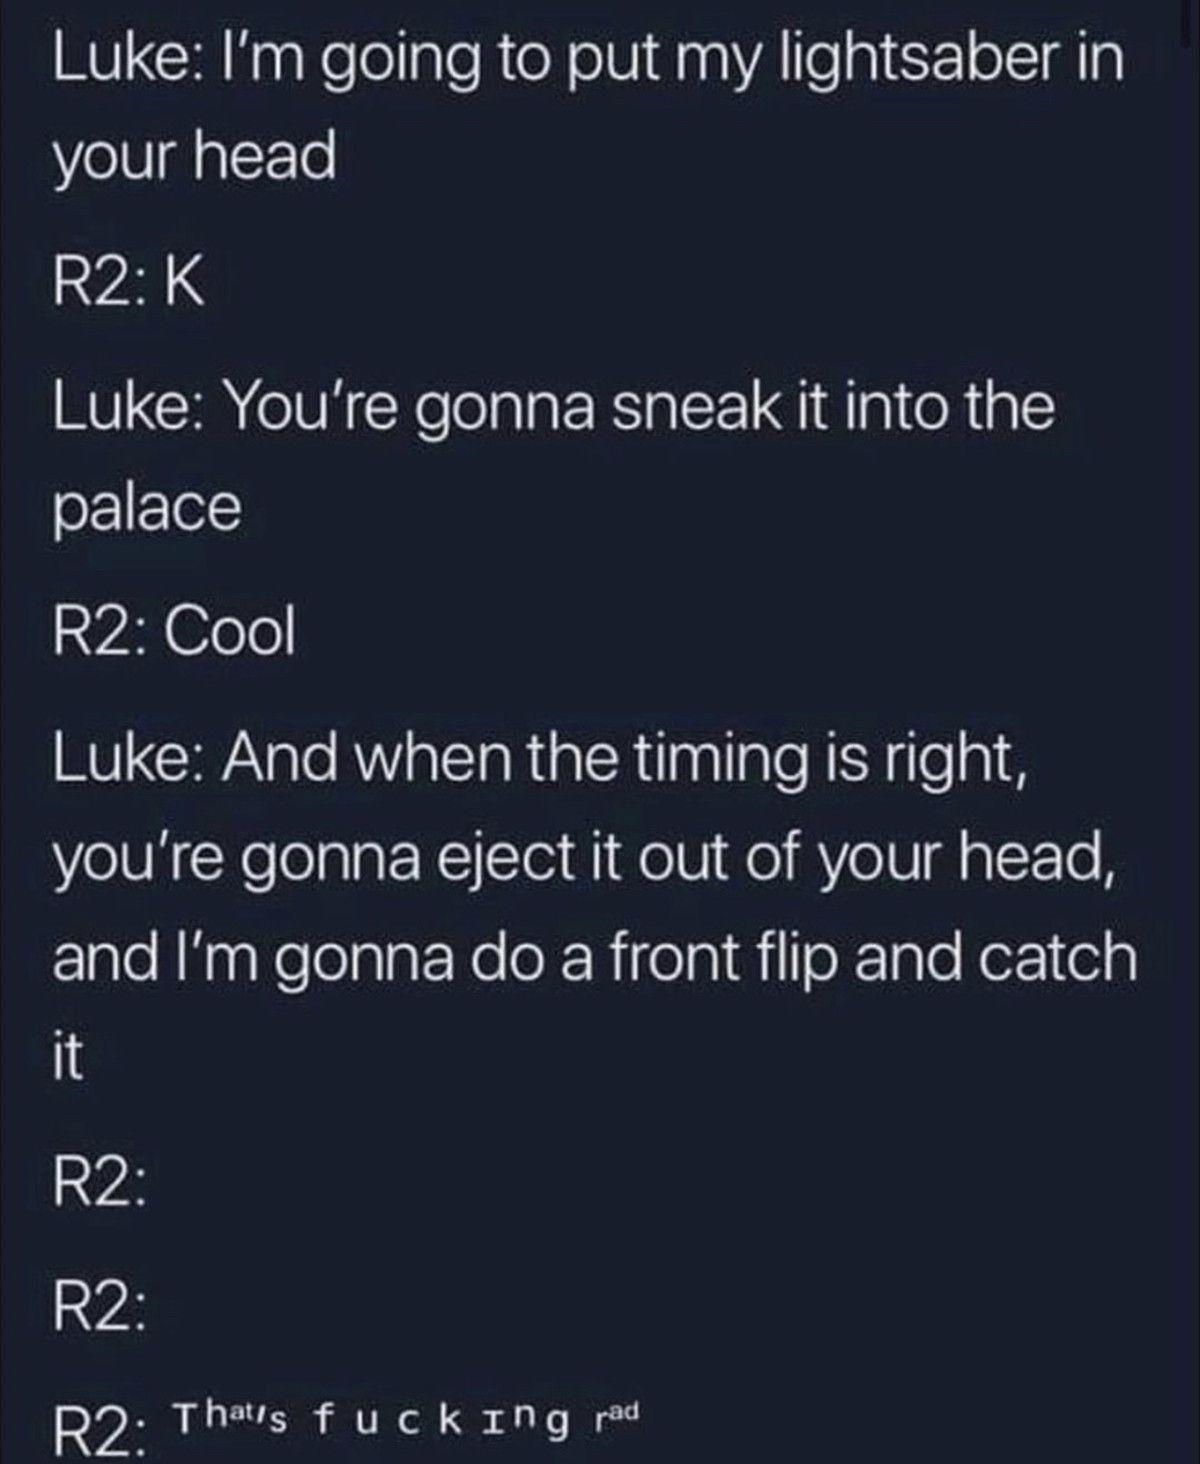 R2 be la